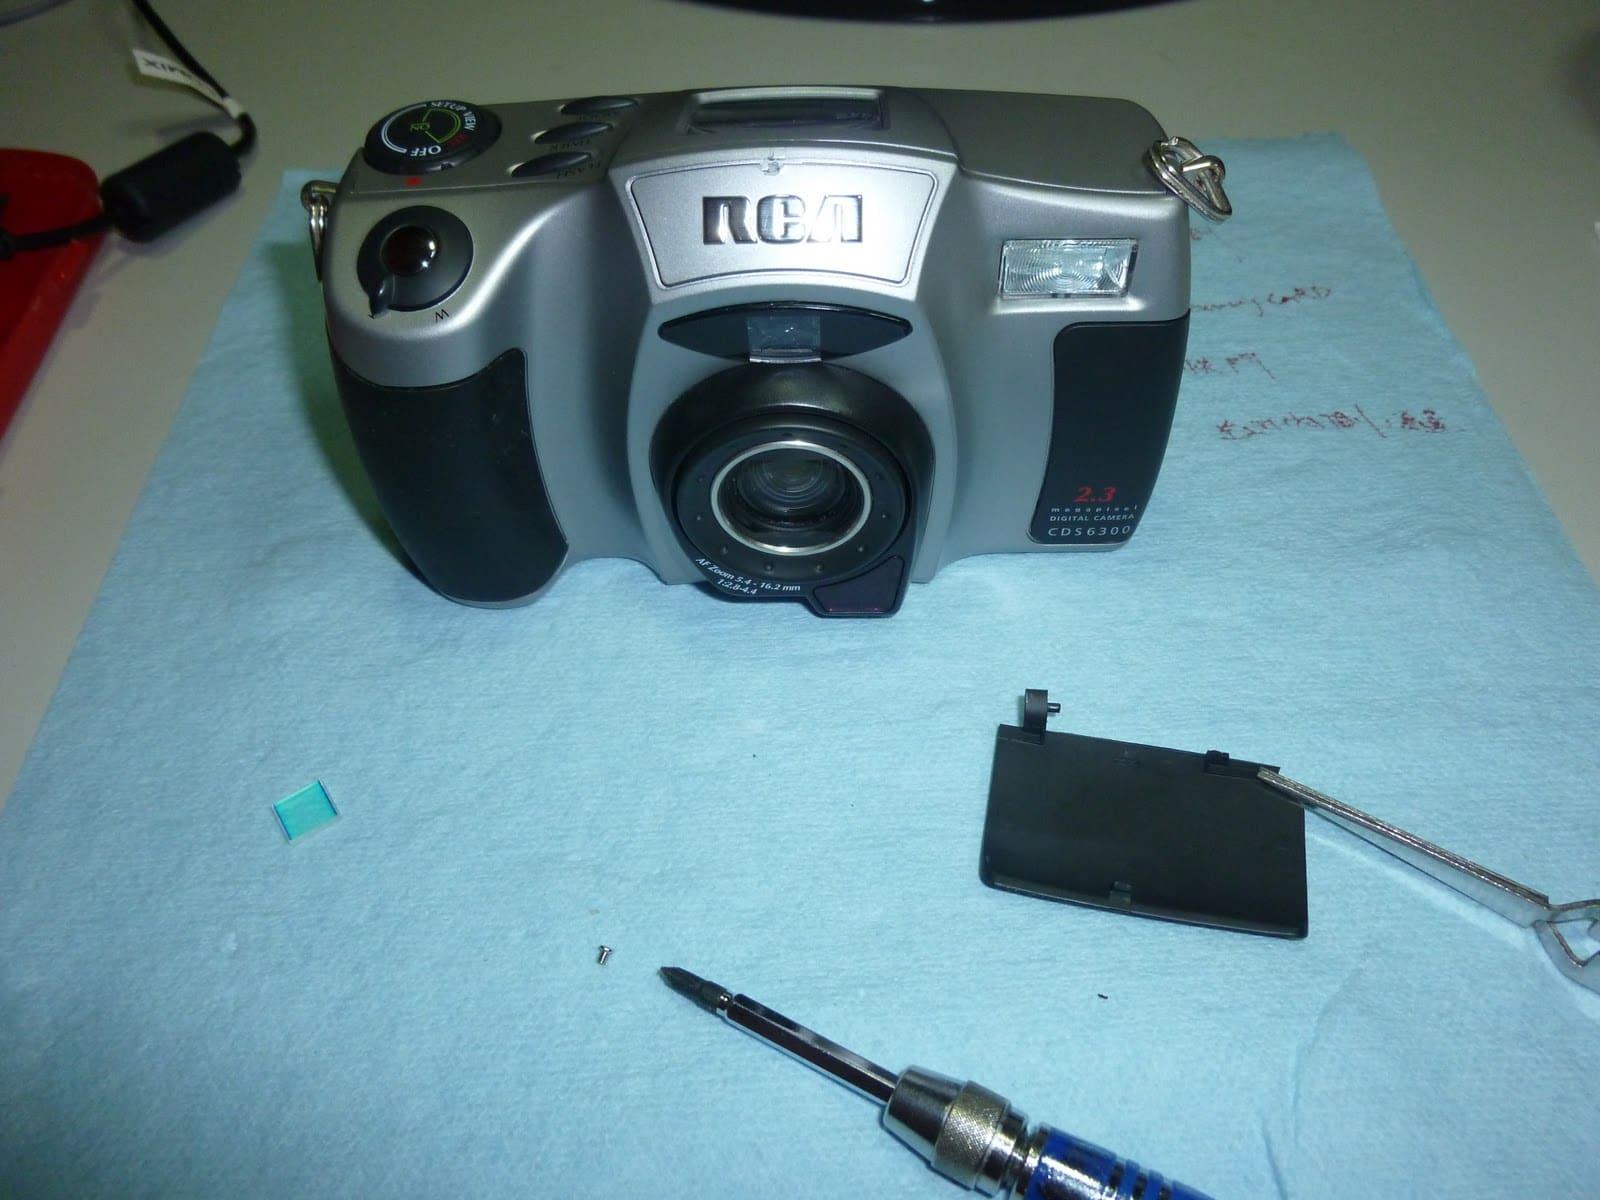 RCA Digital Camera CDS6300 27 拆解 RCA 數位照相機拆解紀錄|改裝紅外線相機